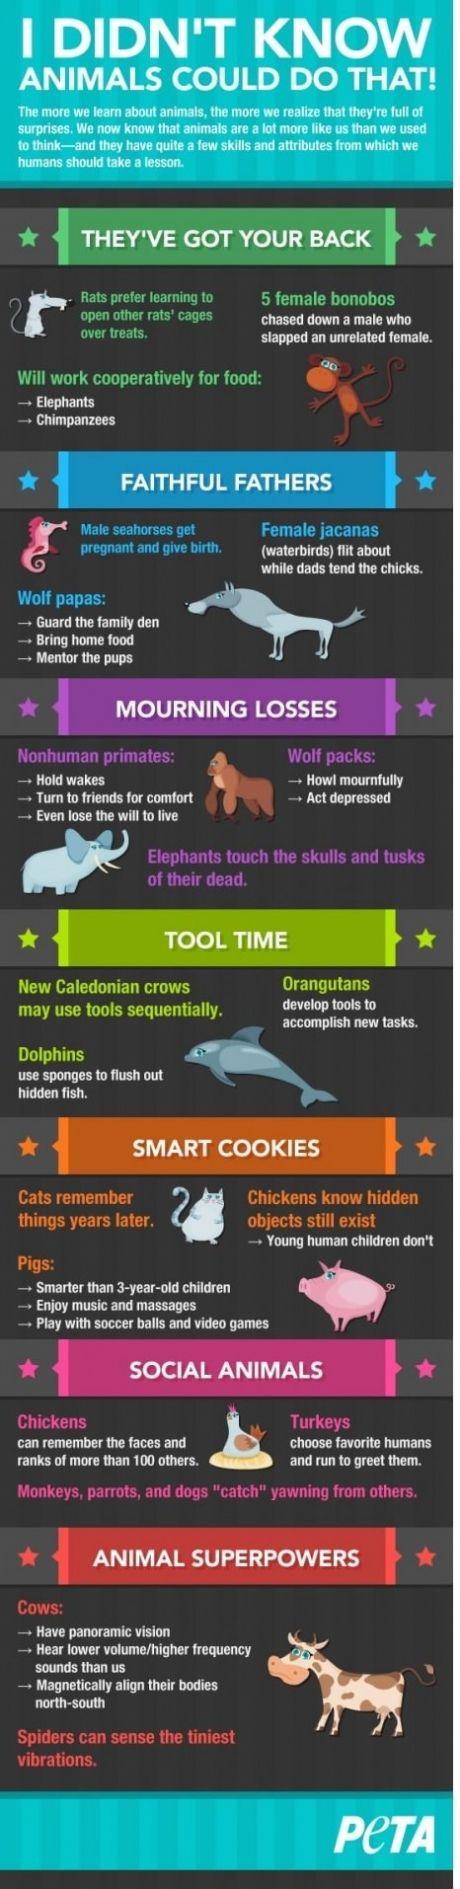 Mind. Blown, animal facts